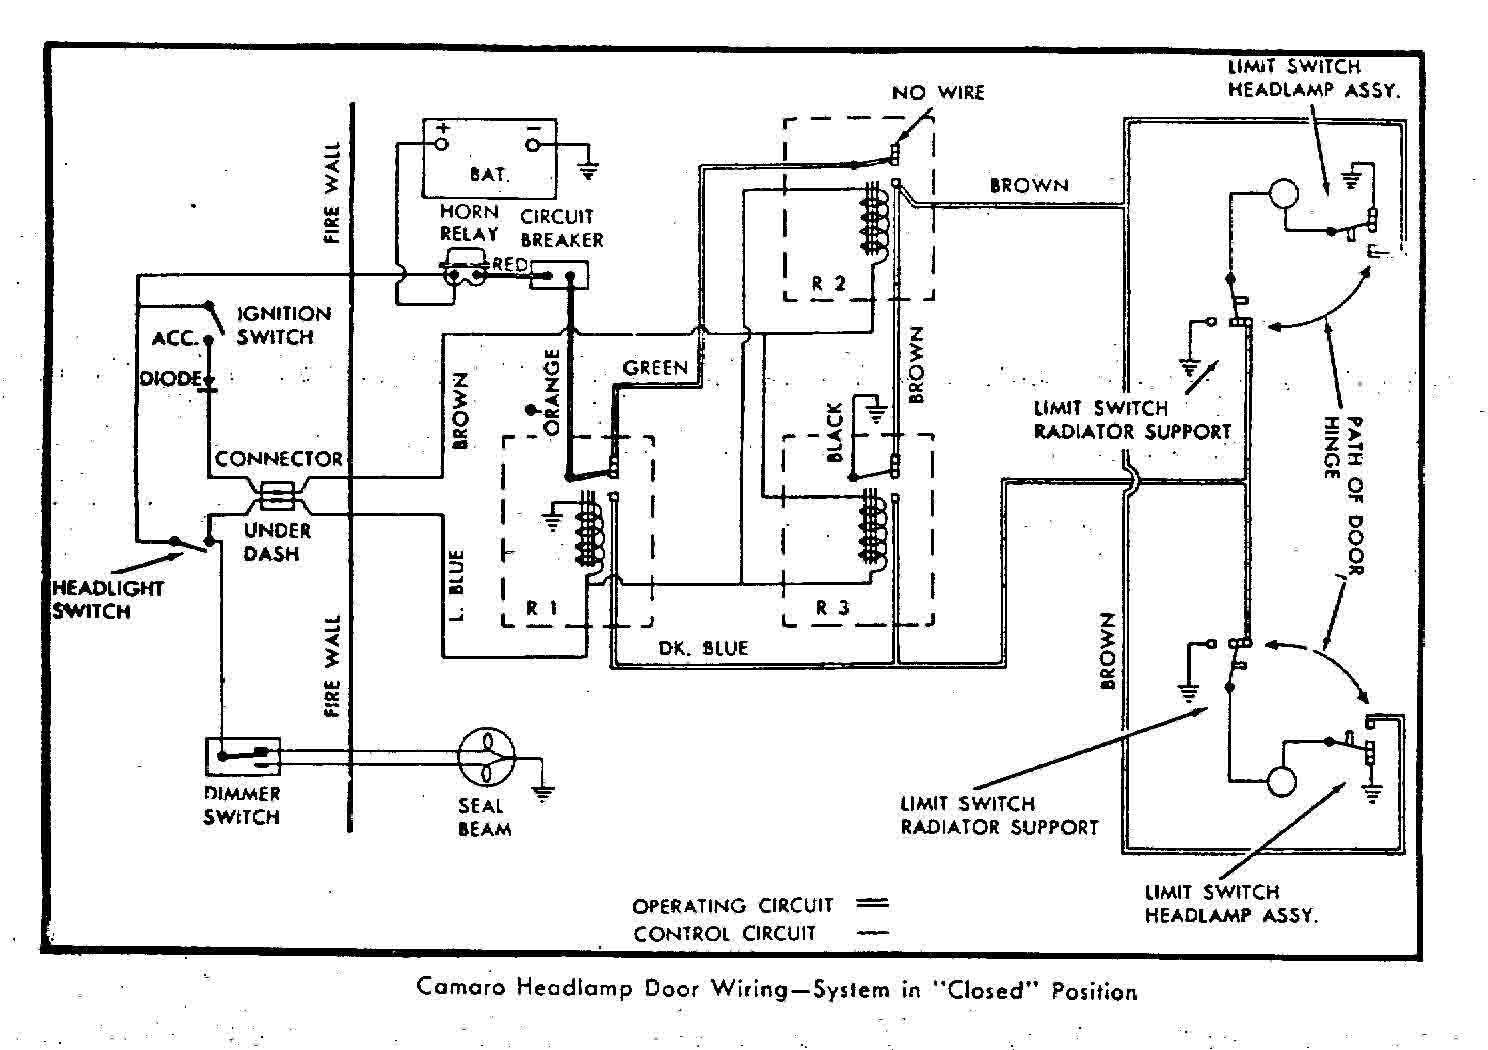 72 Chevy Headlight Wiring Diagram 1996 Camaro Lt1 Wiring Diagram Begeboy Wiring Diagram Source